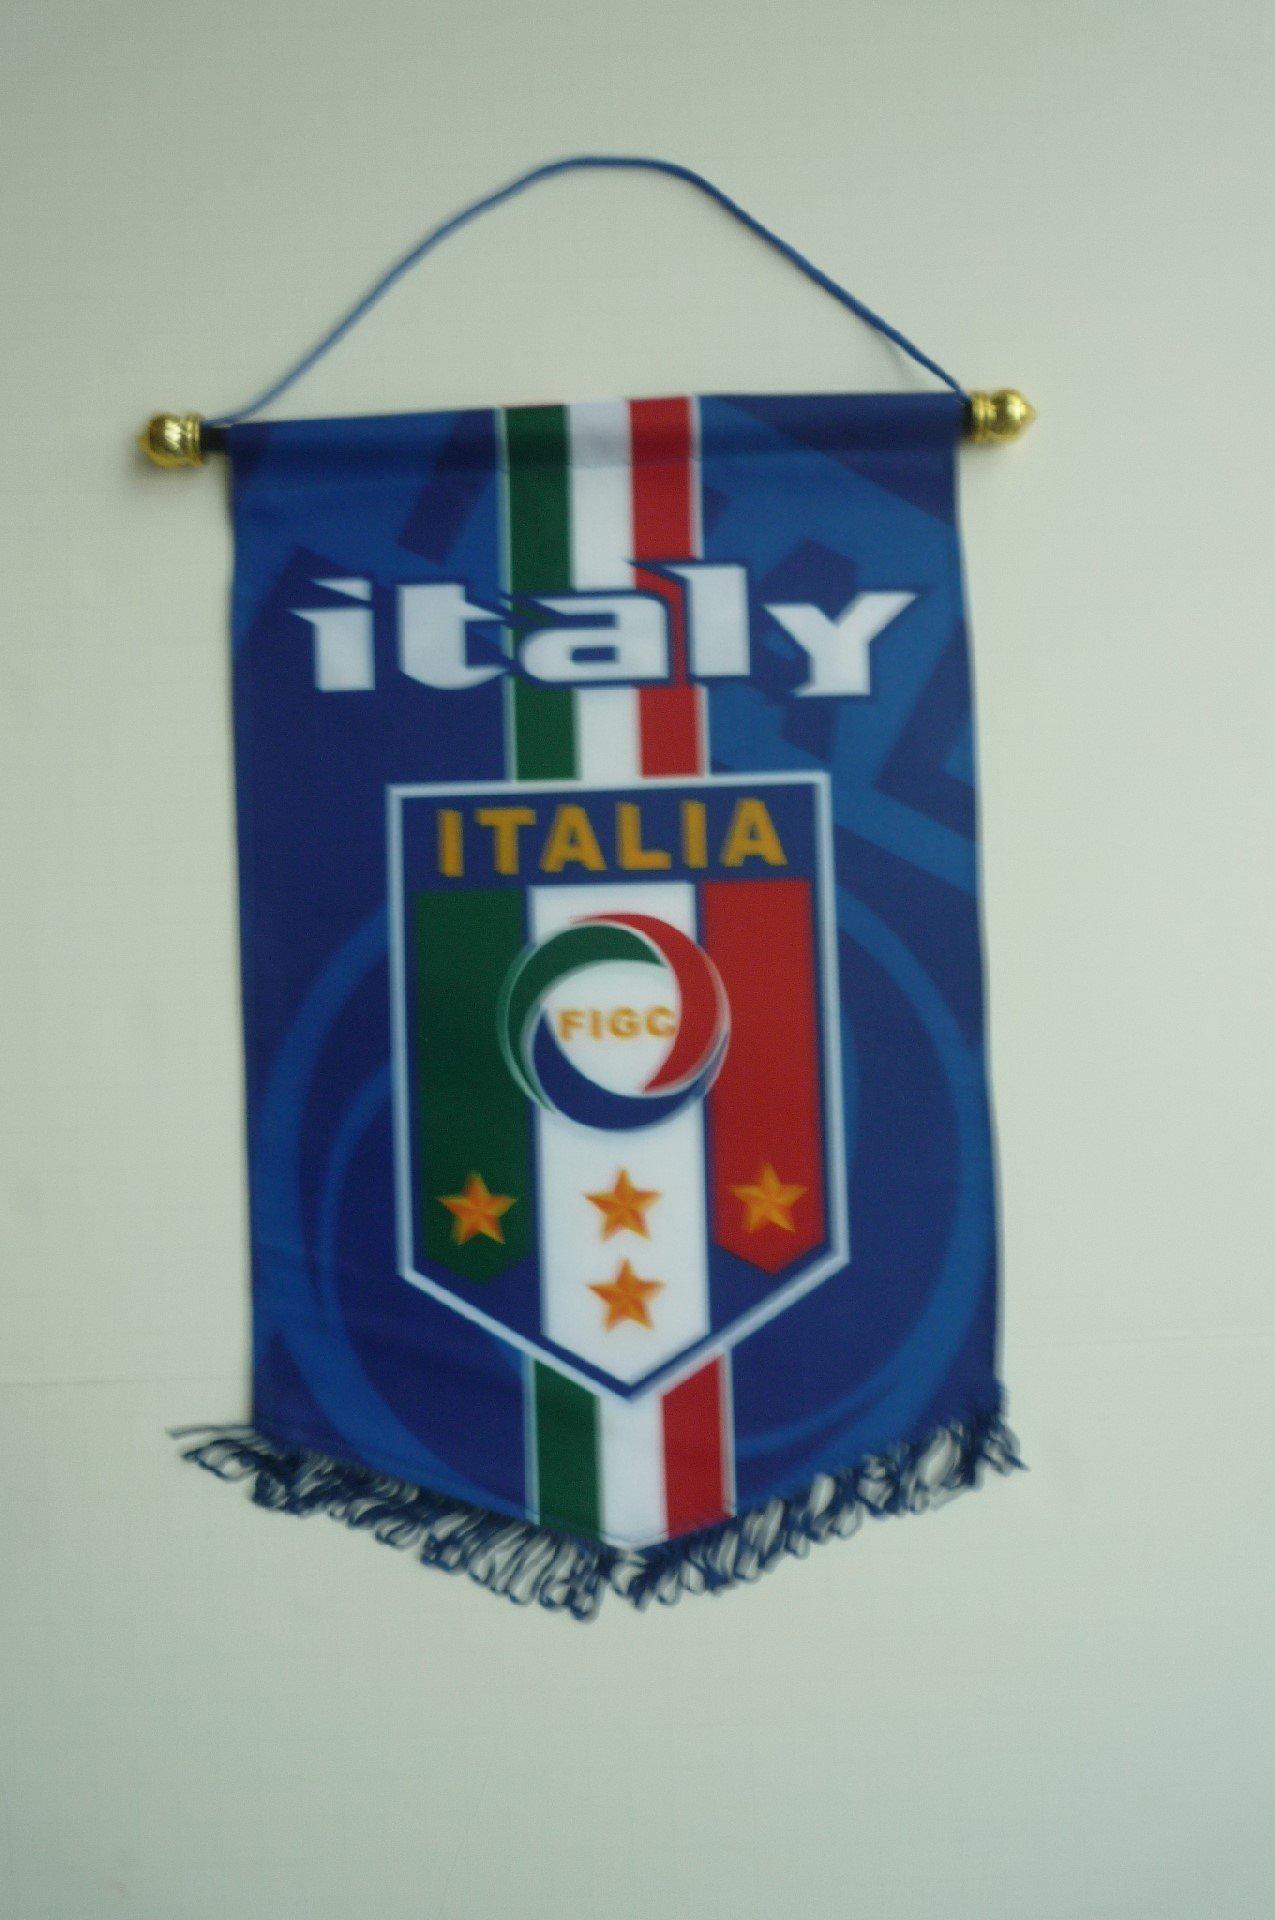 ITALIA ITALY BADGE LOGO FOOTBALL SOCCER PENNANT BANNER